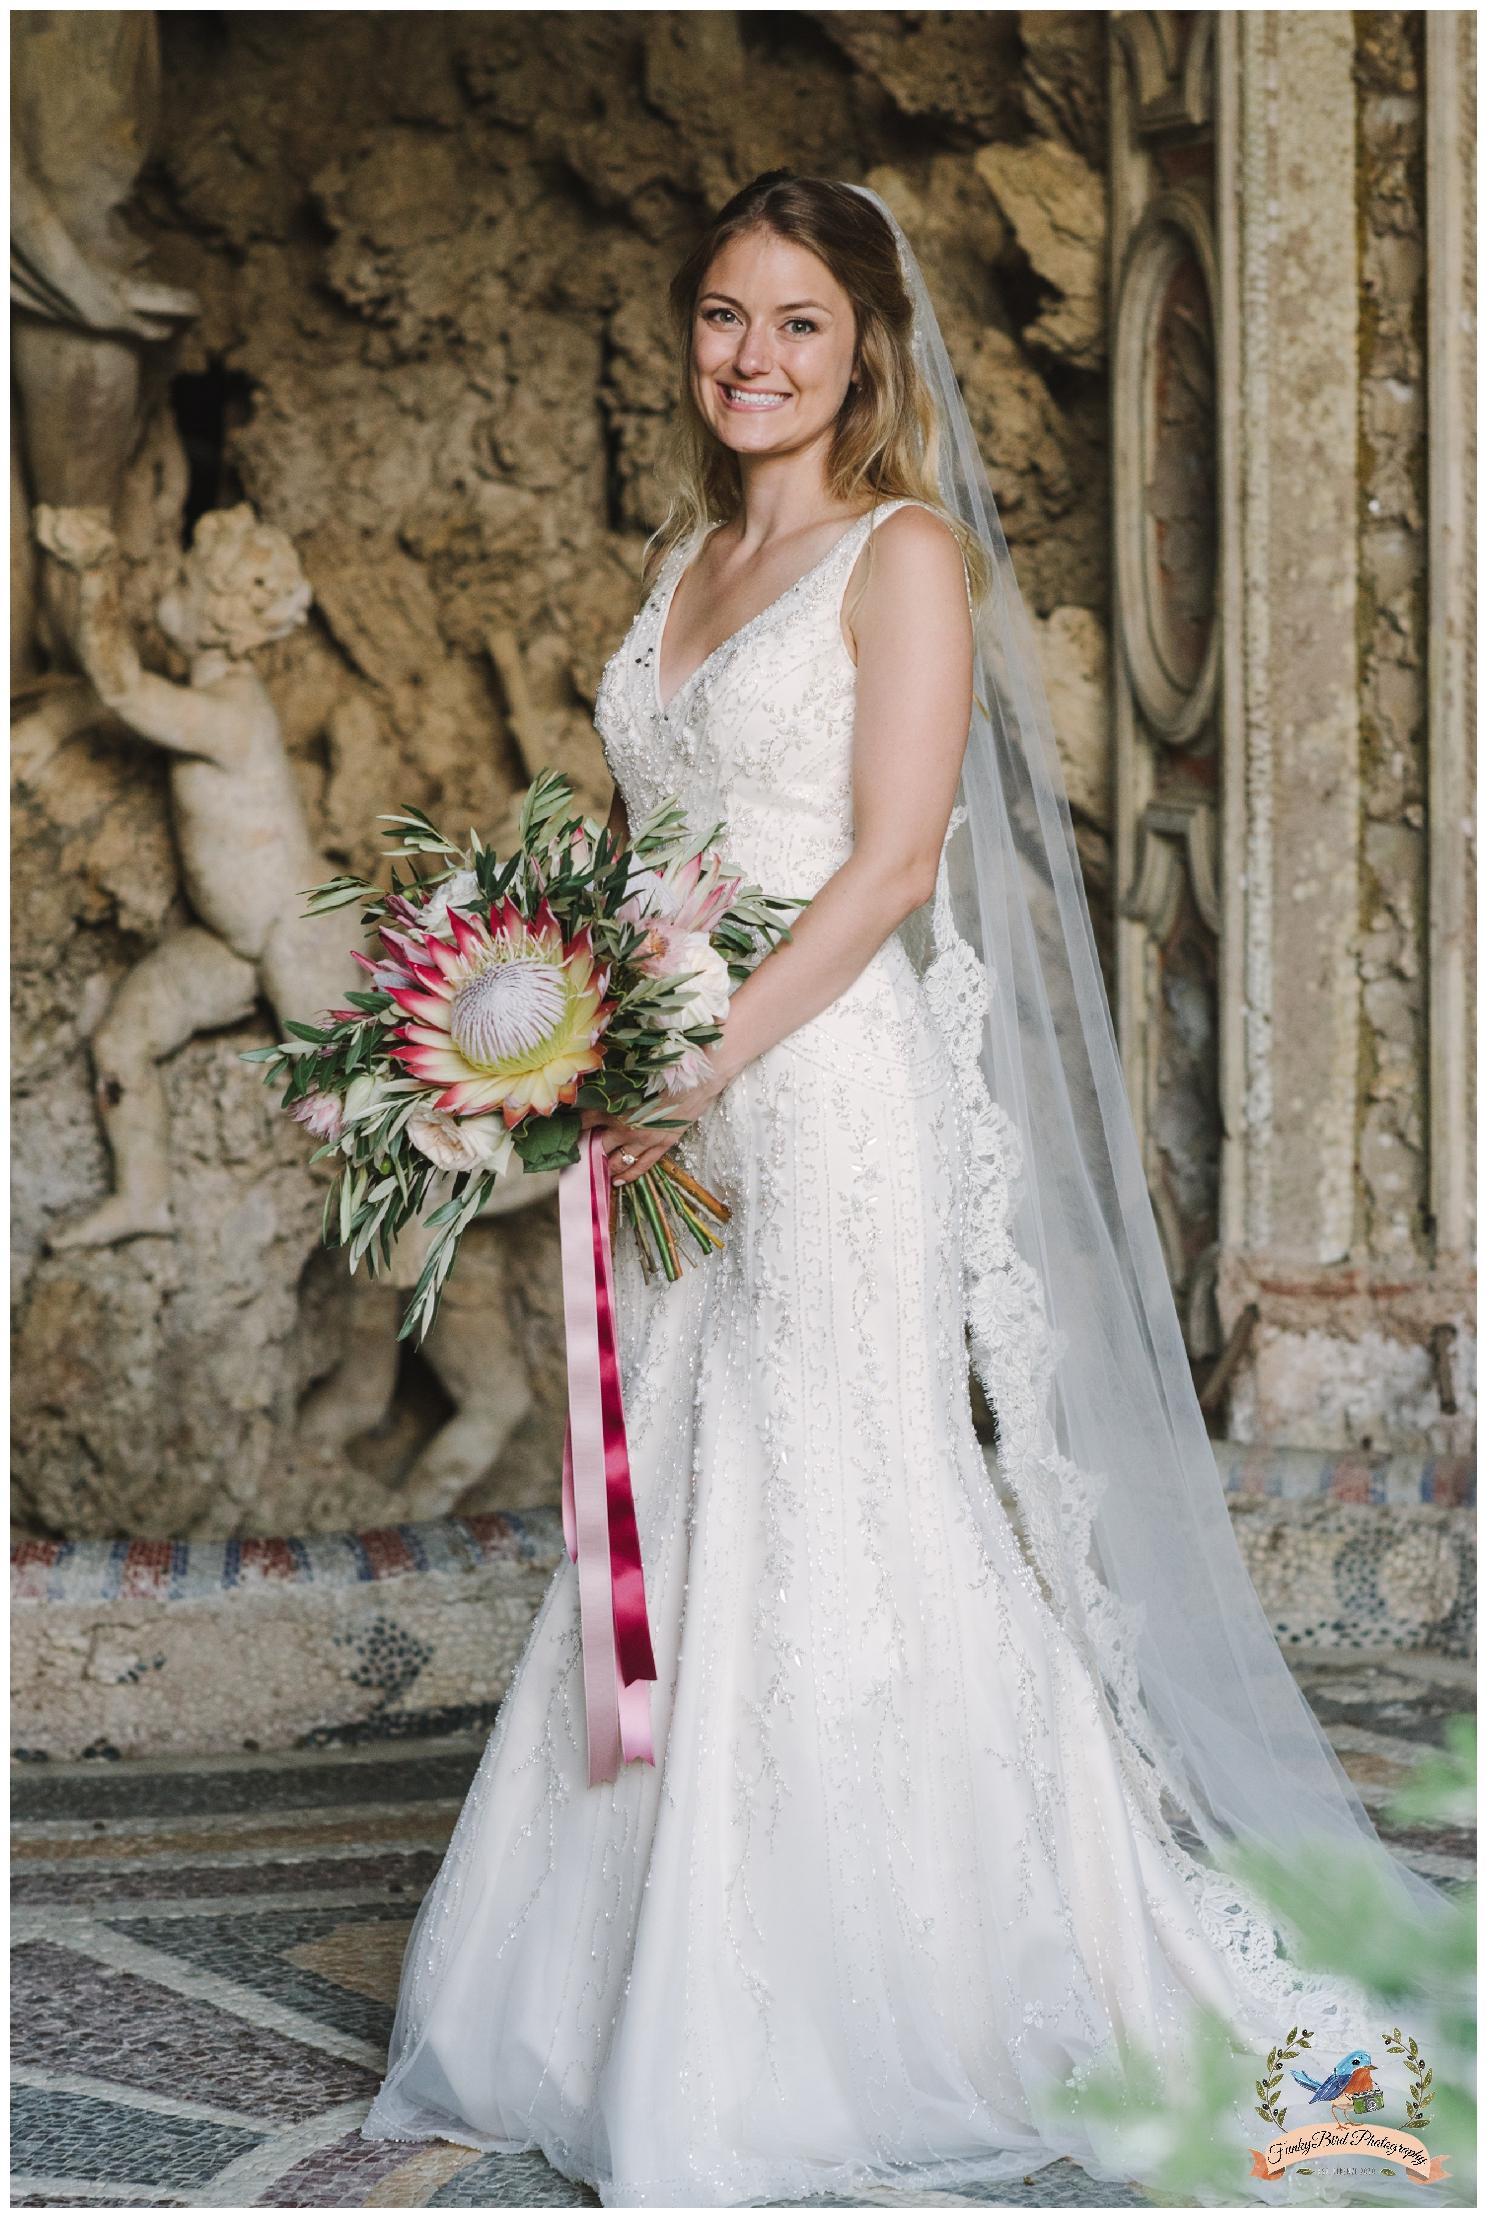 Wedding_Photographer_Tuscany_Italy_0057.jpg